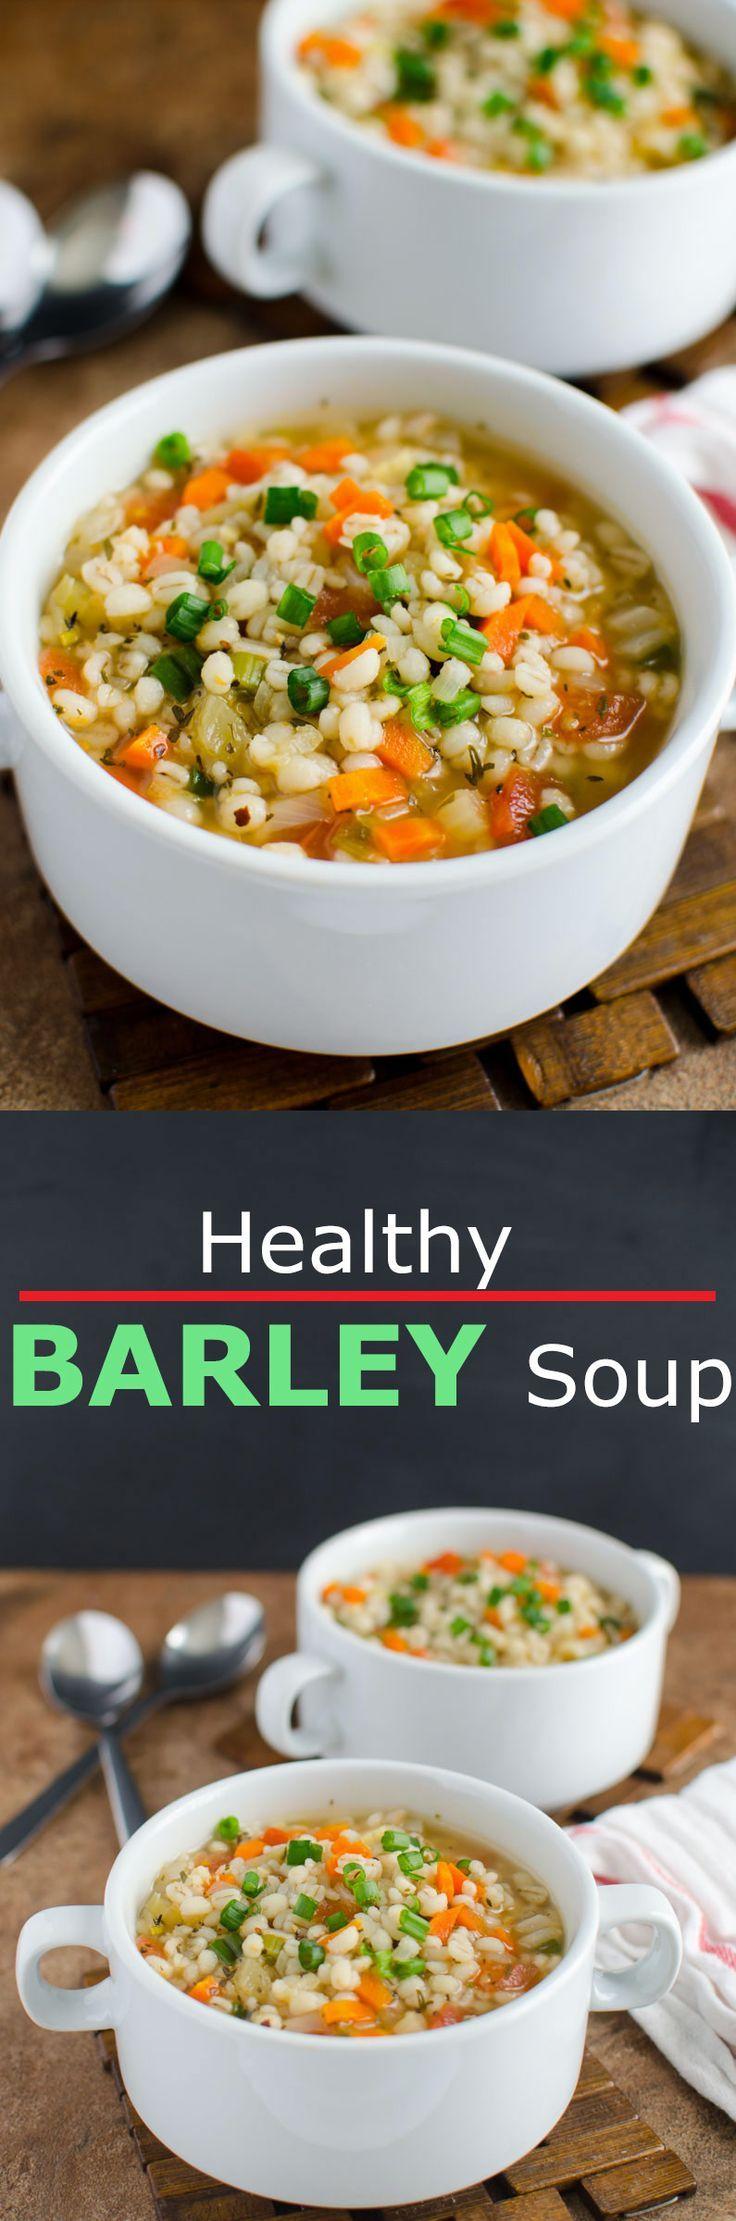 Barley Soup Recipe Healthy recipes, Food recipes, Soup